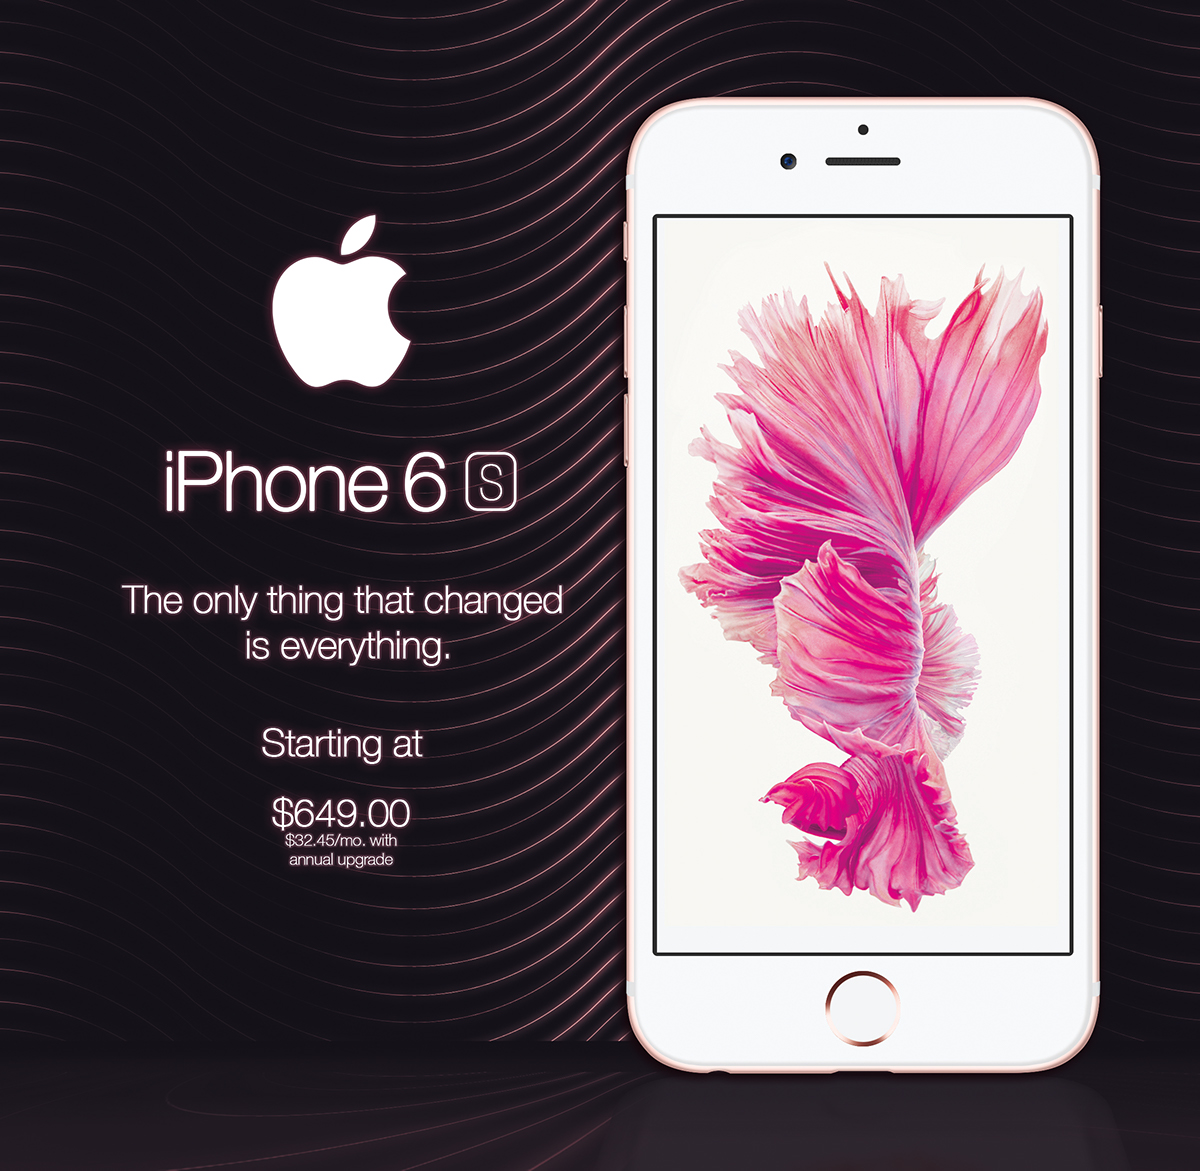 Iphone 6s Advertisement Digital Painting On Behance